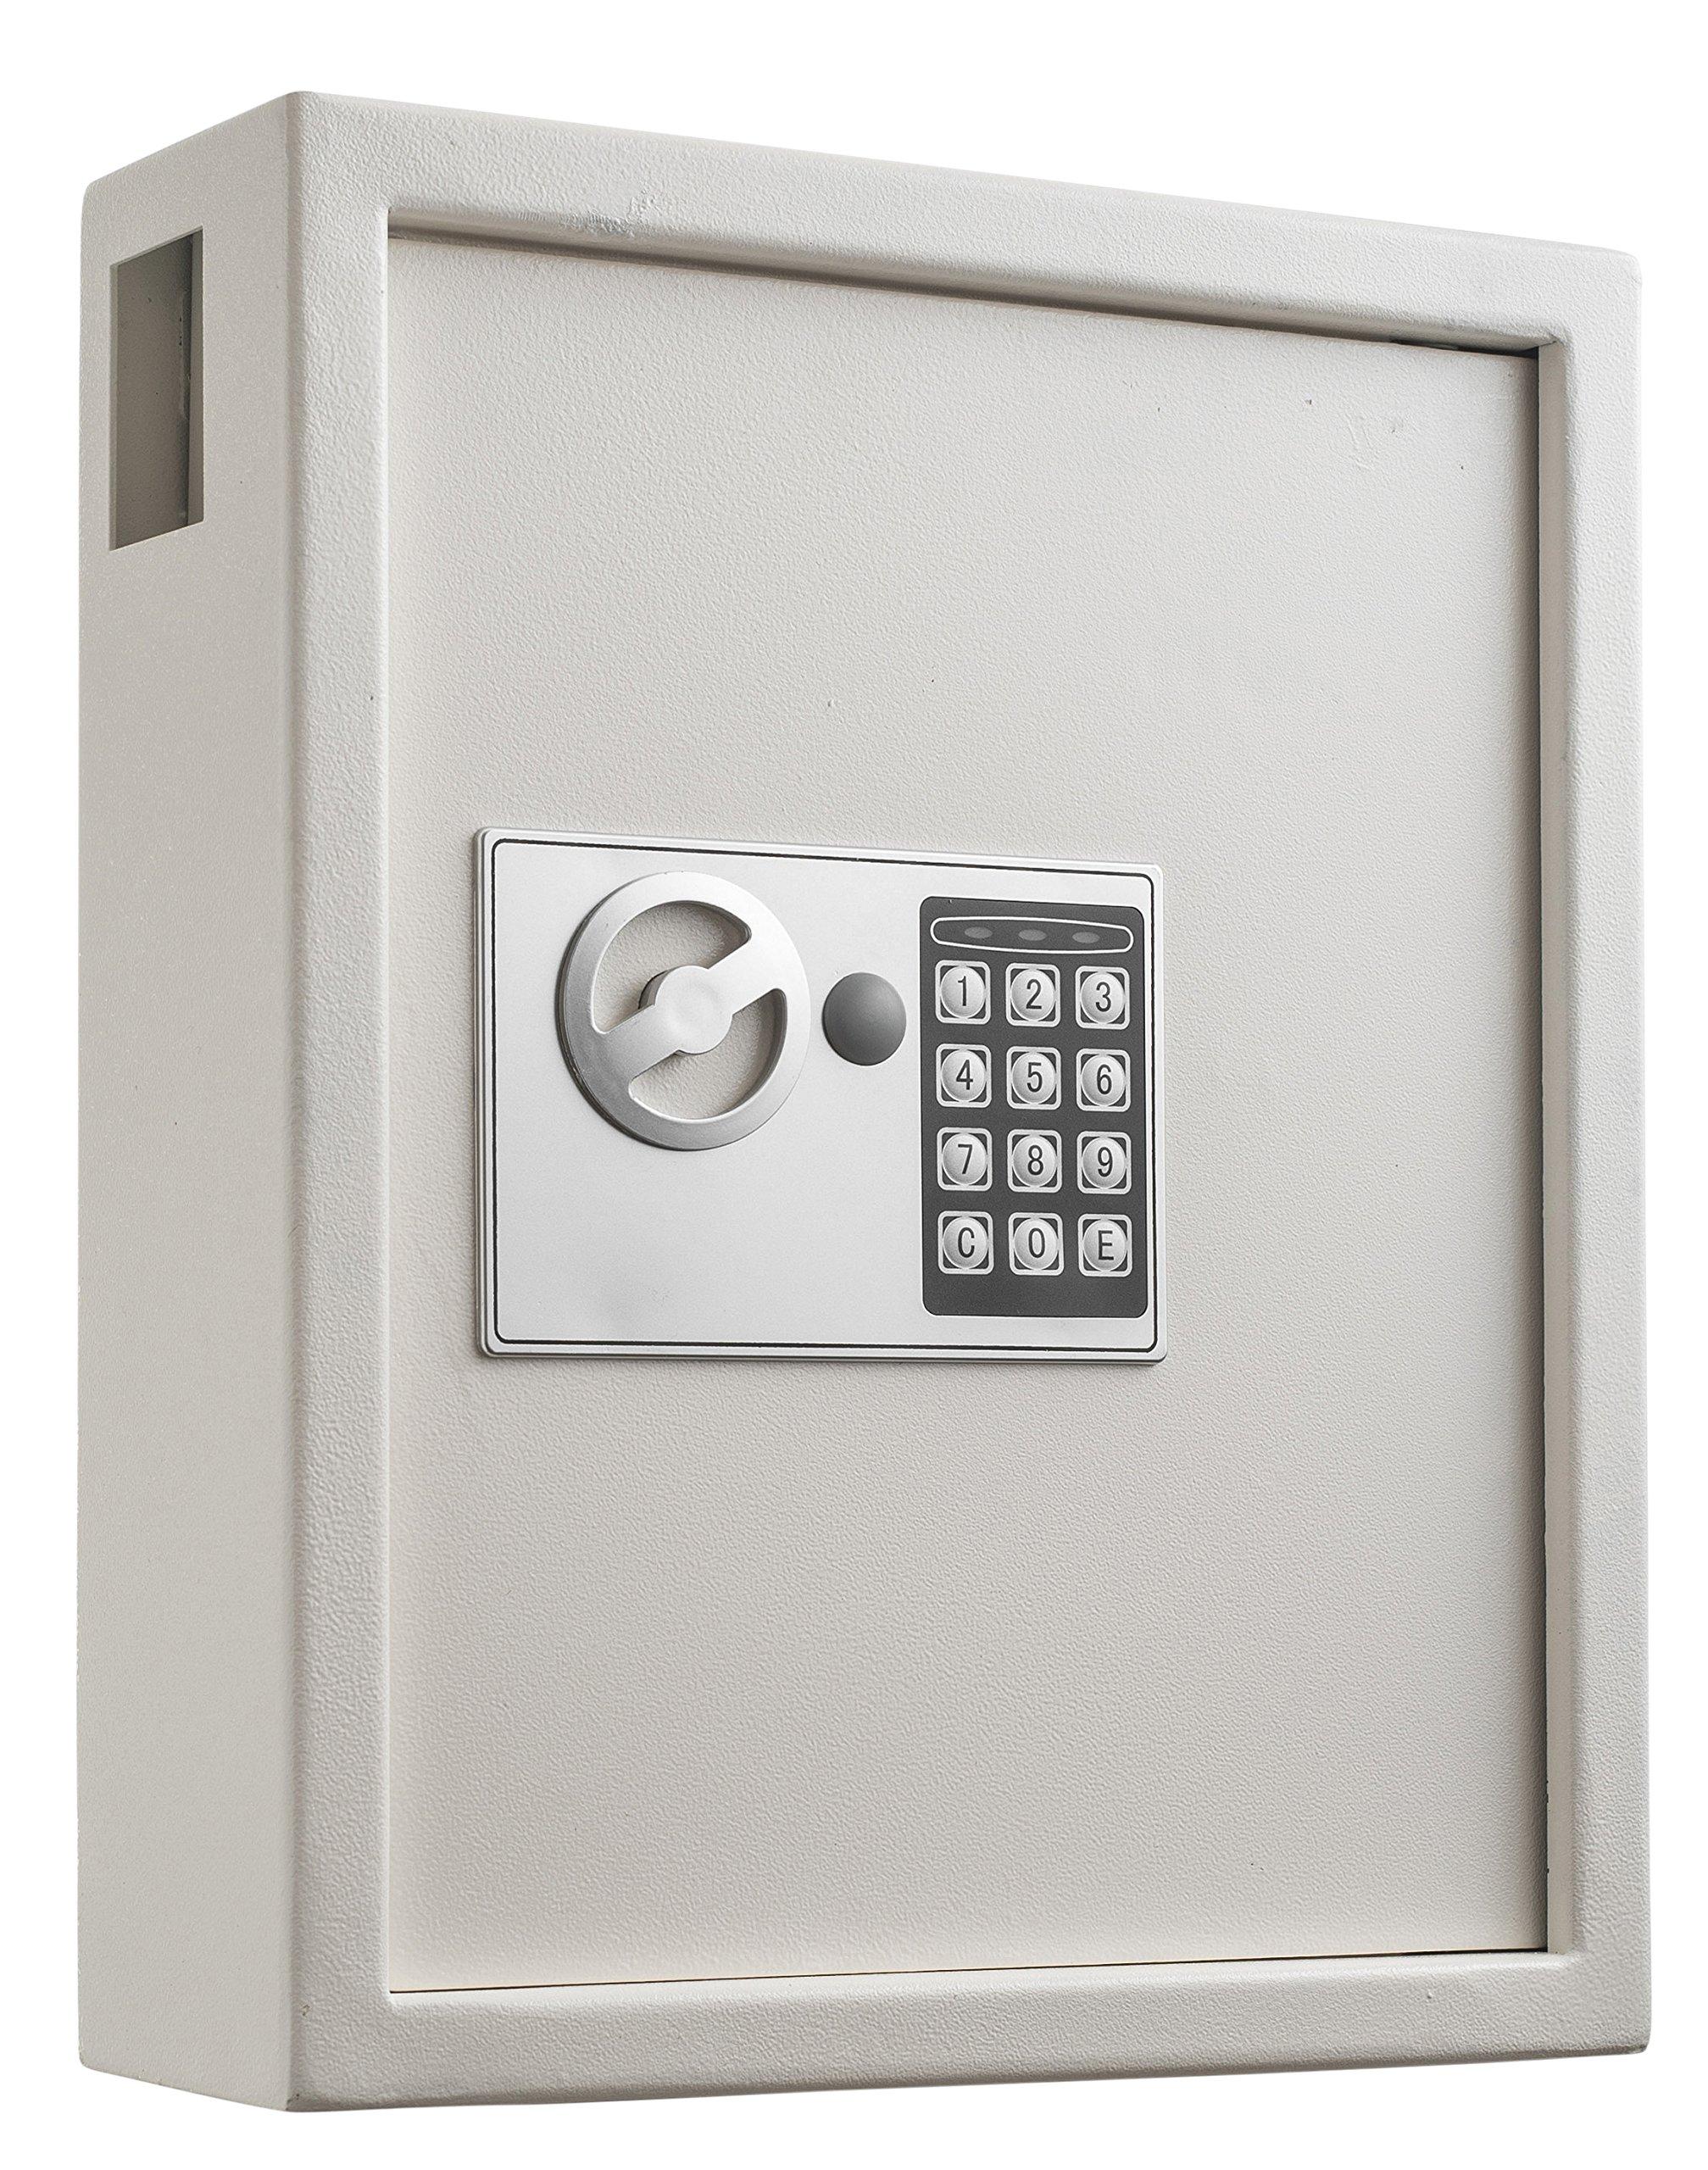 AdirOffice 40 Keys Cabinet with Digital Lock - Electronic Key Safe - Pin Code Keyless Storage Box for Keys - Secure Steel Lockbox - Scratch Resistant Powder Coated - Wall Anchor (White)